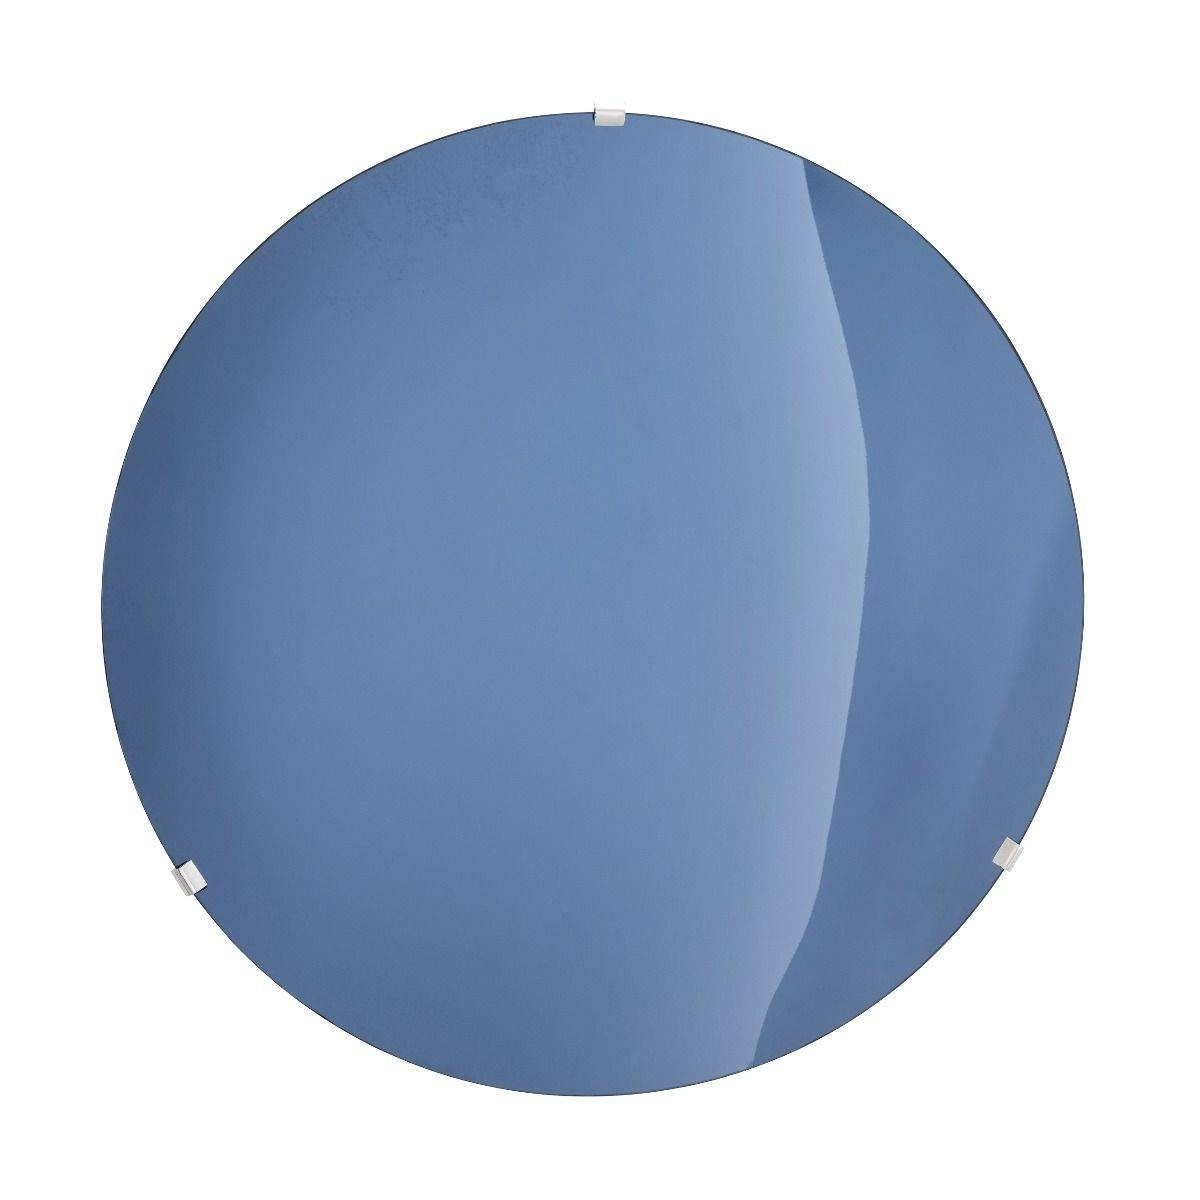 Laguna Solid Blue Wall Object